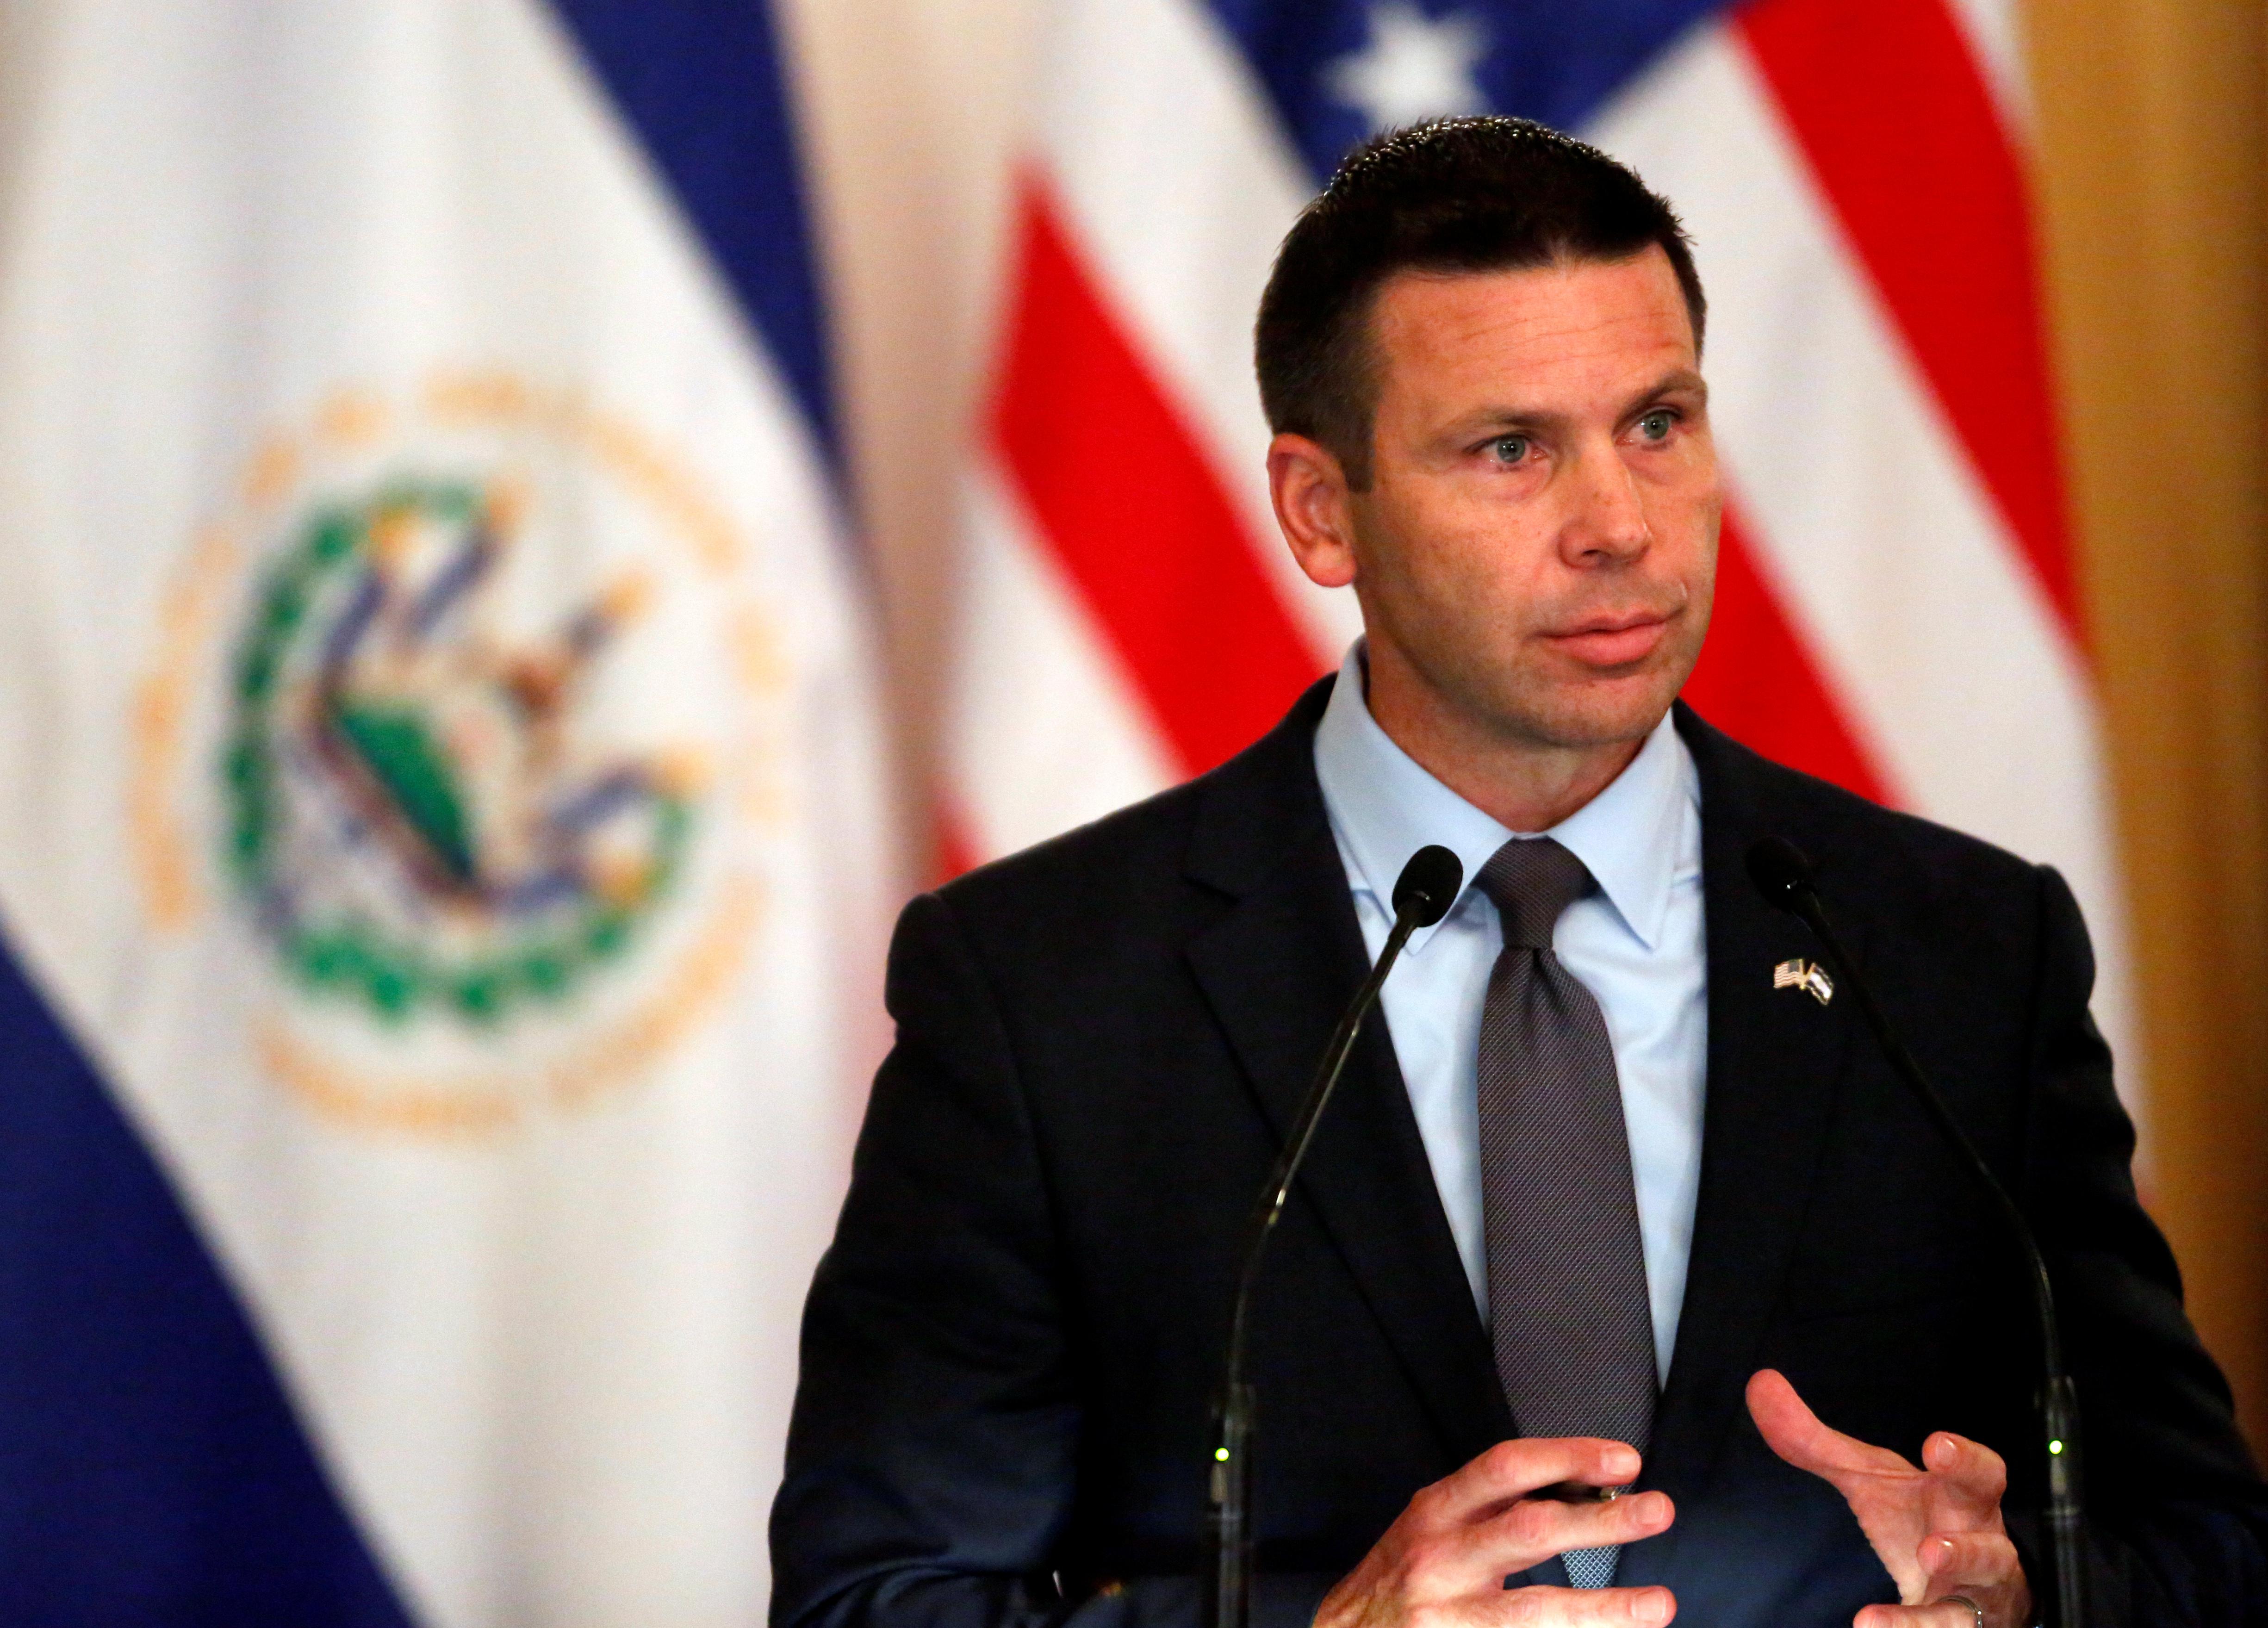 FILE PHOTO: U.S. DHS acting Secretary McAleenan visits El Salvador in San Salvador